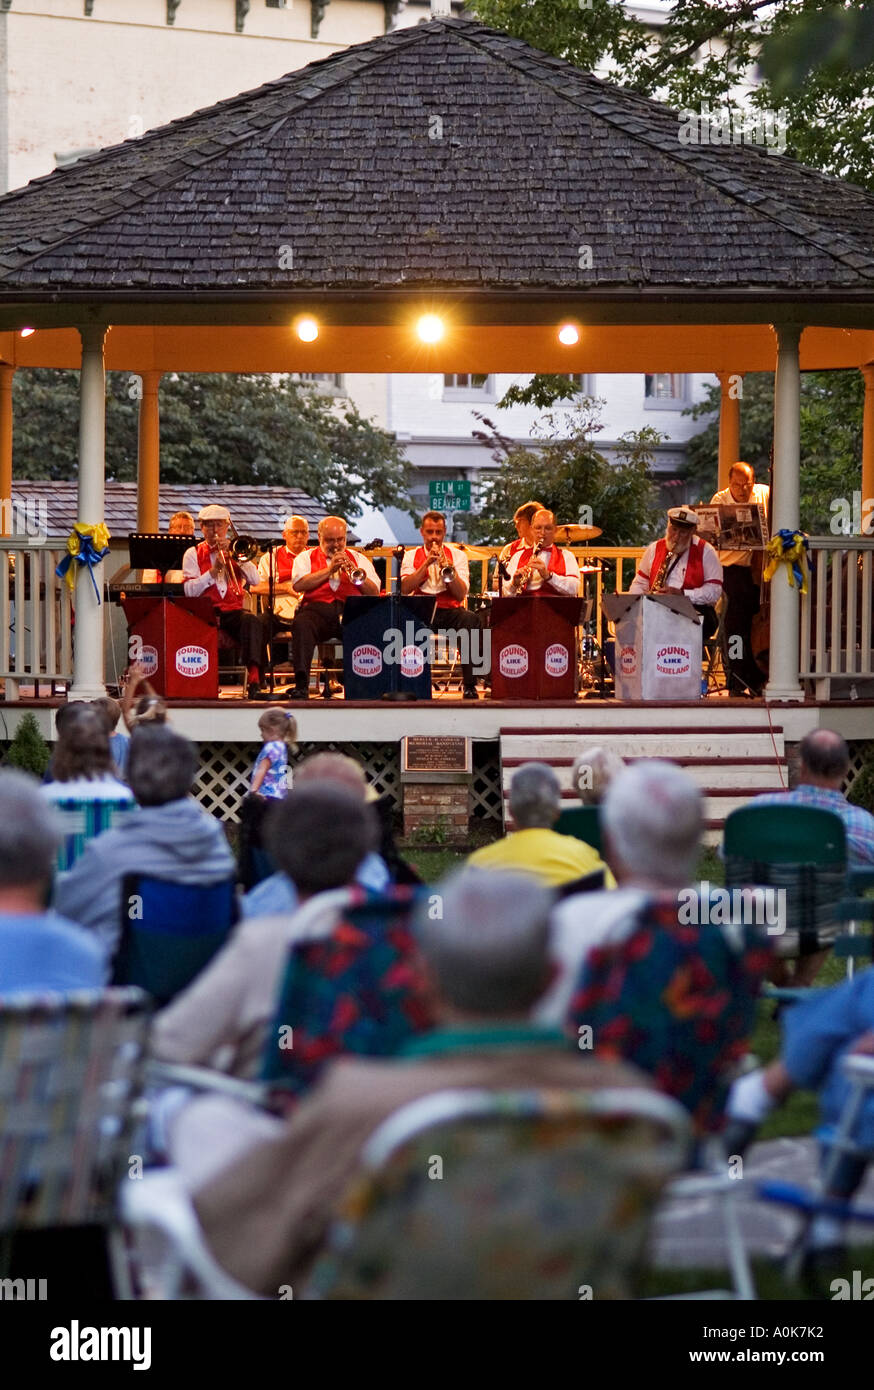 Band spielt Konzert unter Pavillon In kleine Stadtplatz Corydon Indiana Stockbild